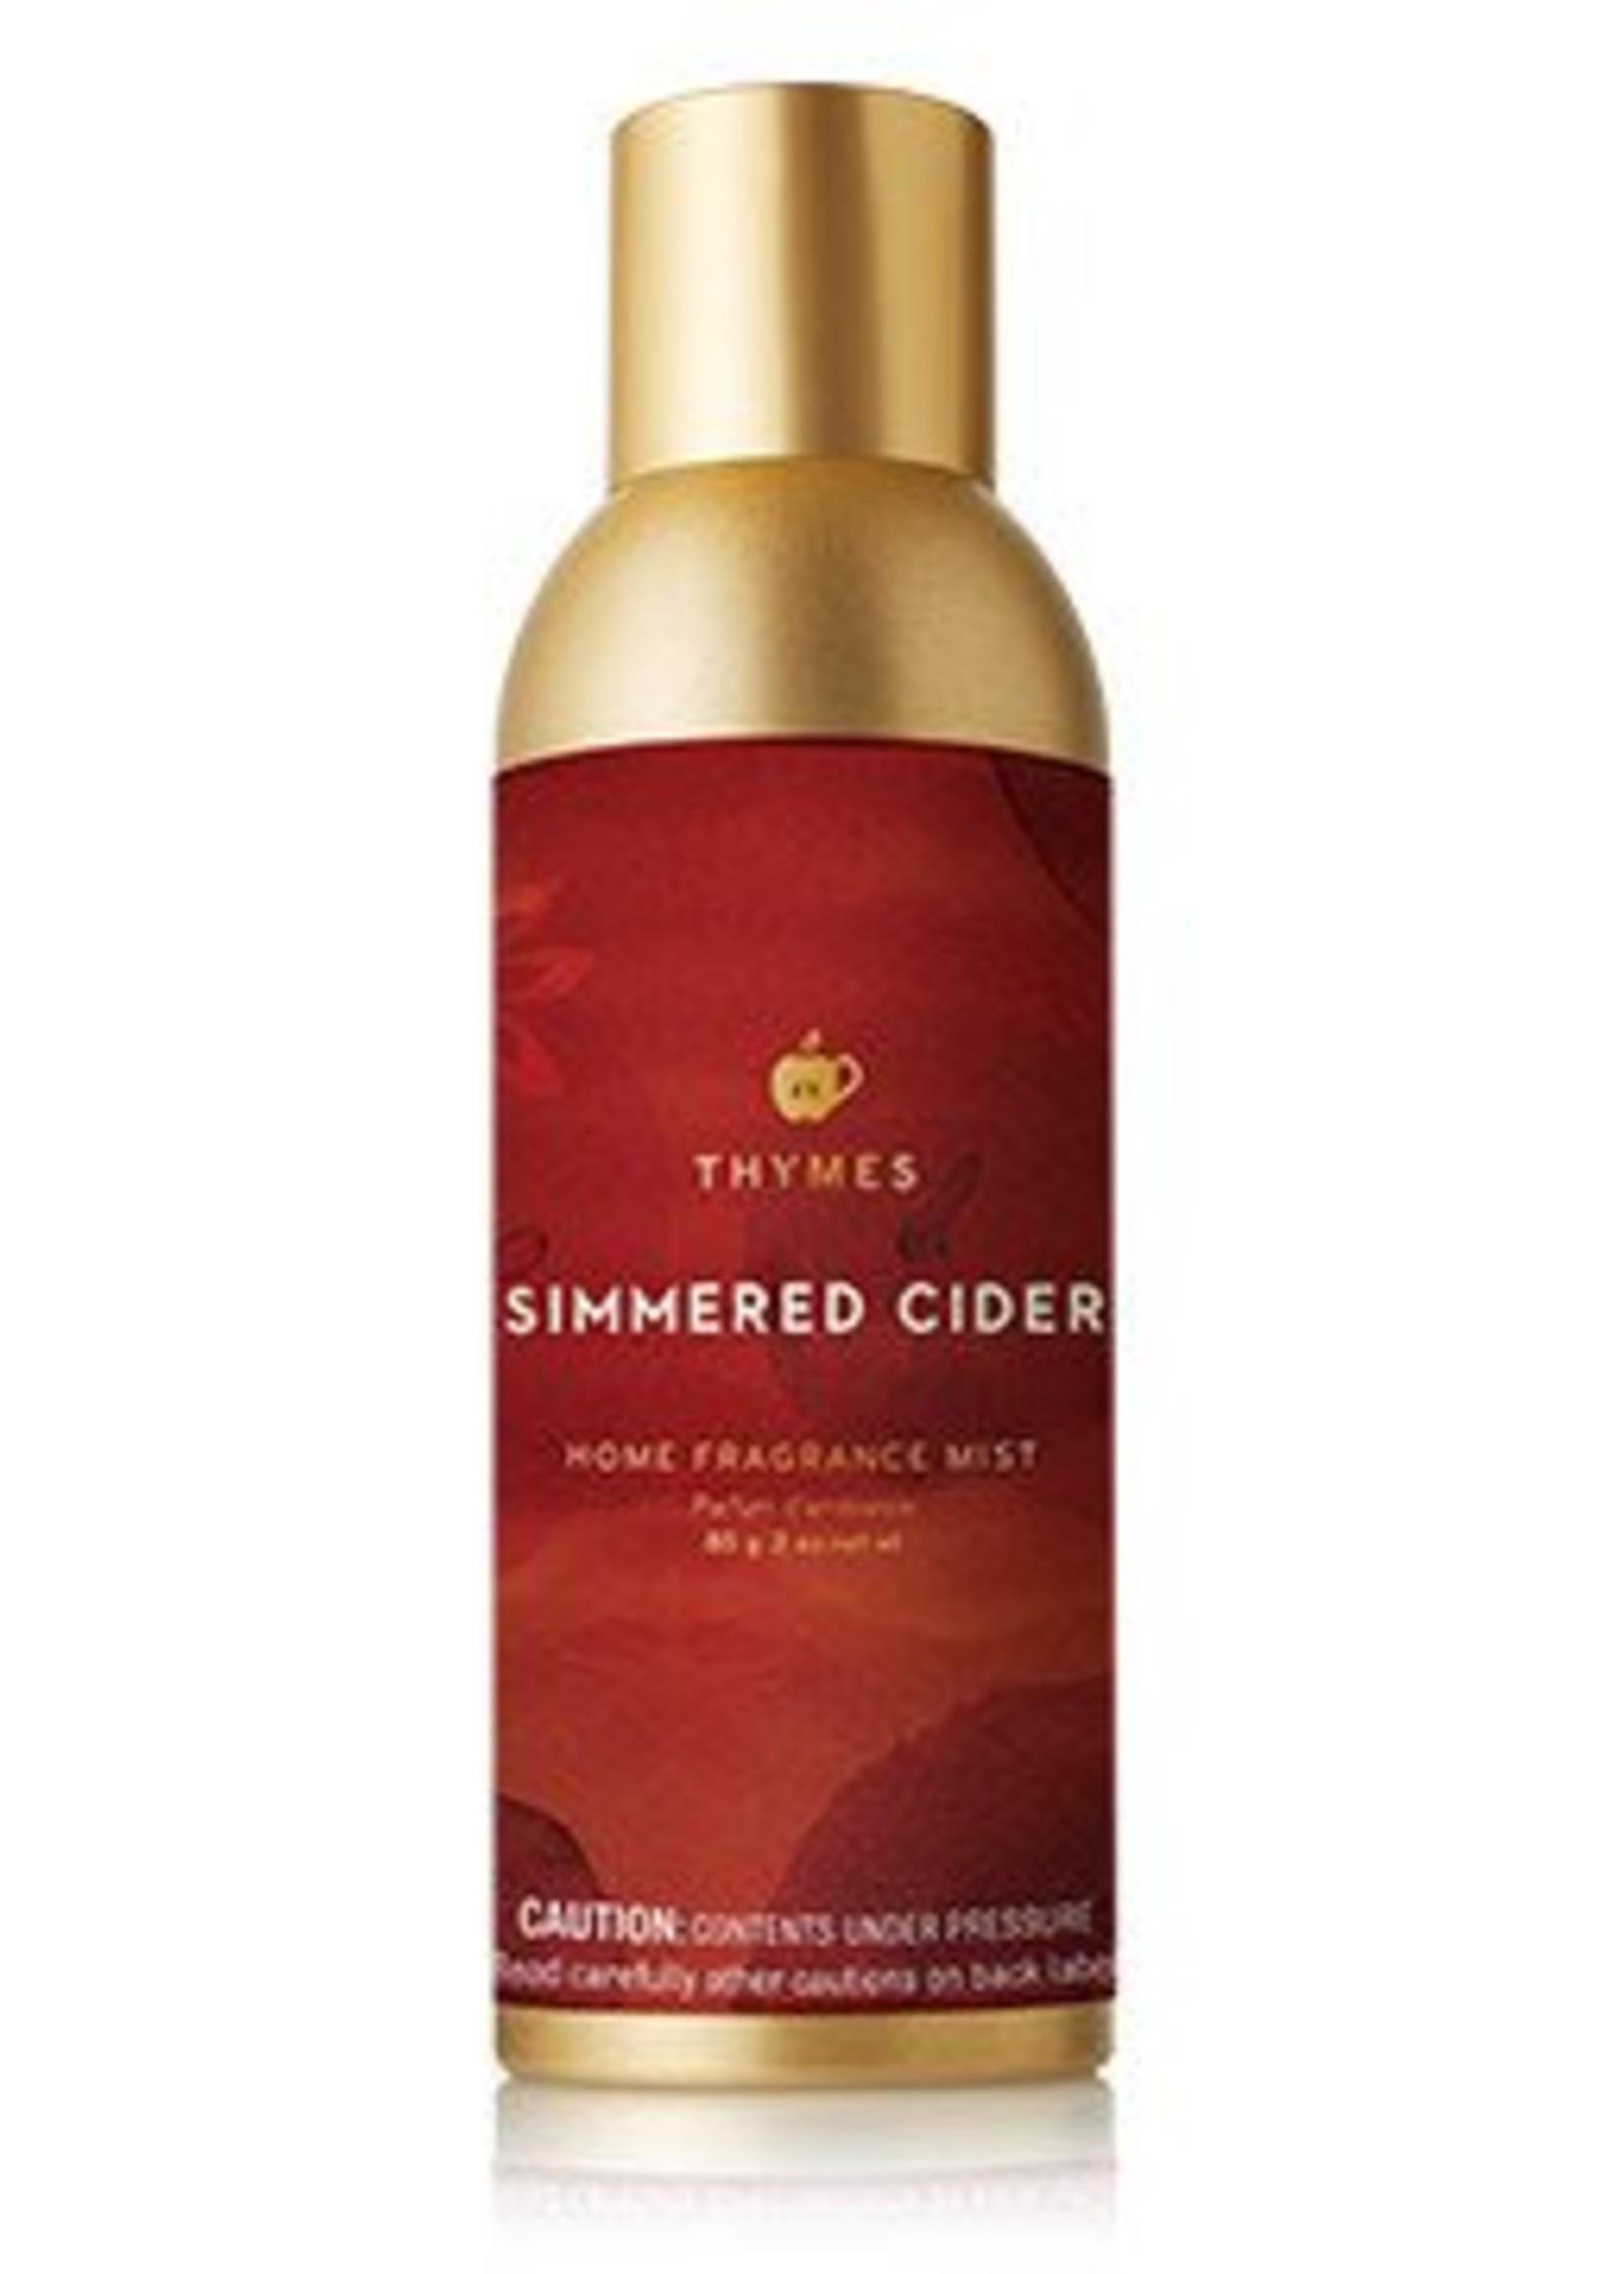 Thymes Home Fragrance Mist Simmered Cider